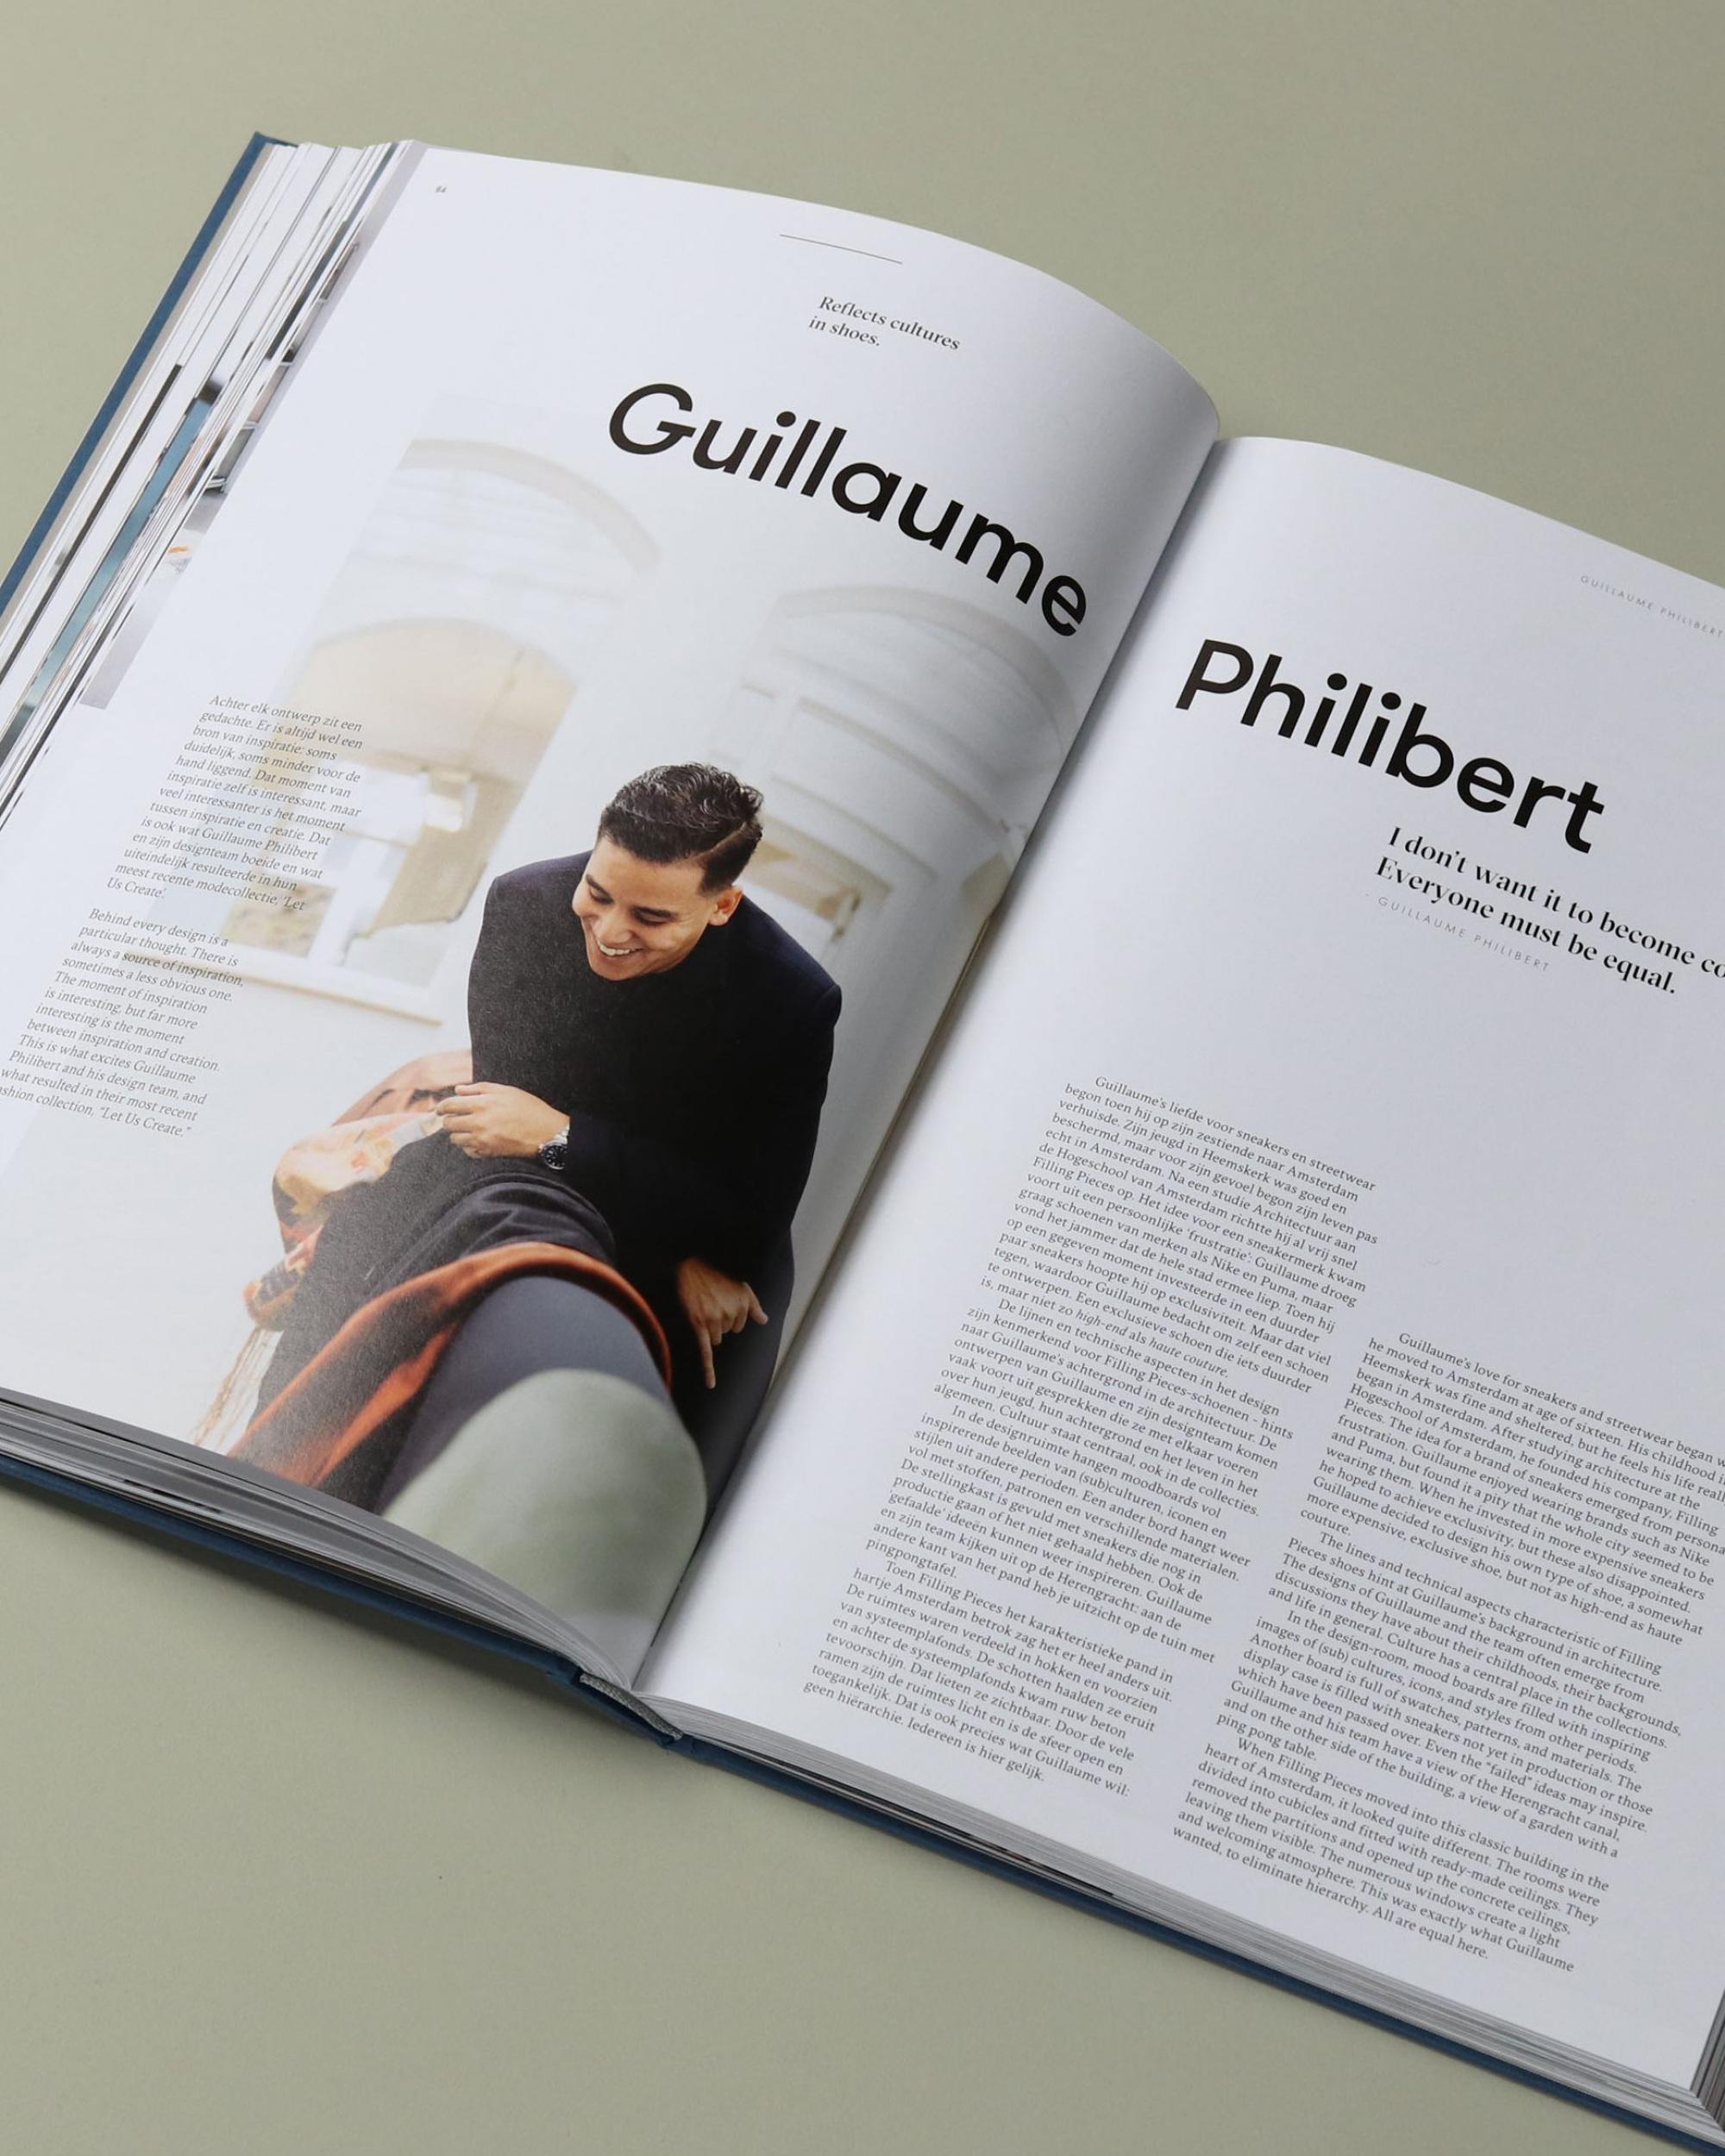 The-Workshop-Inhoud-Guillaume-Philibert-1-e1492080041157-2000x2500-c-default.jpg